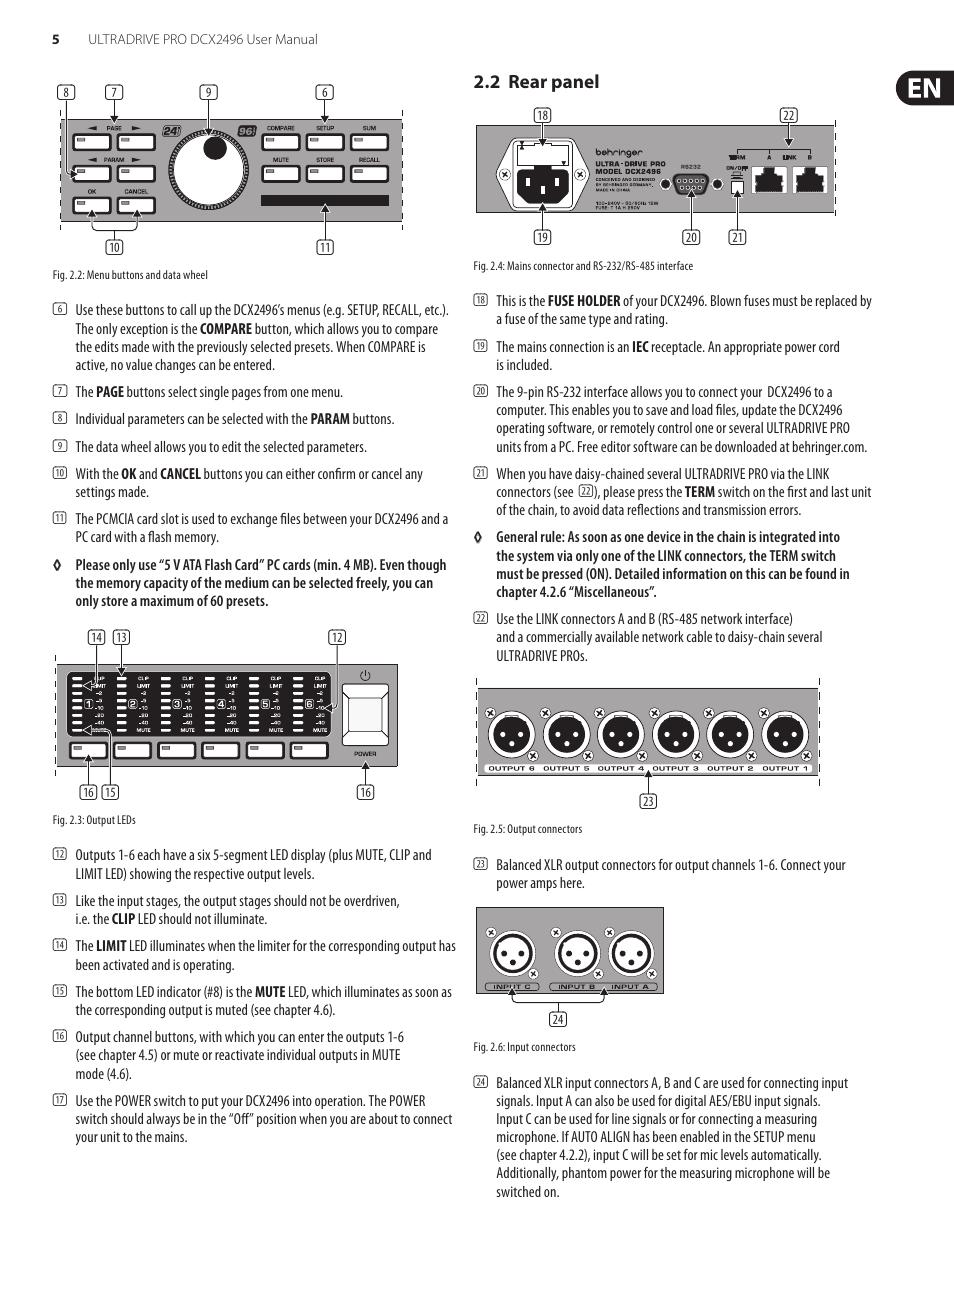 behringer dcx2496 instruction manual free owners manual u2022 rh wordworksbysea com 4th Gen Cummins 6.7 Review 4th Gen Cummins 6.7 Review